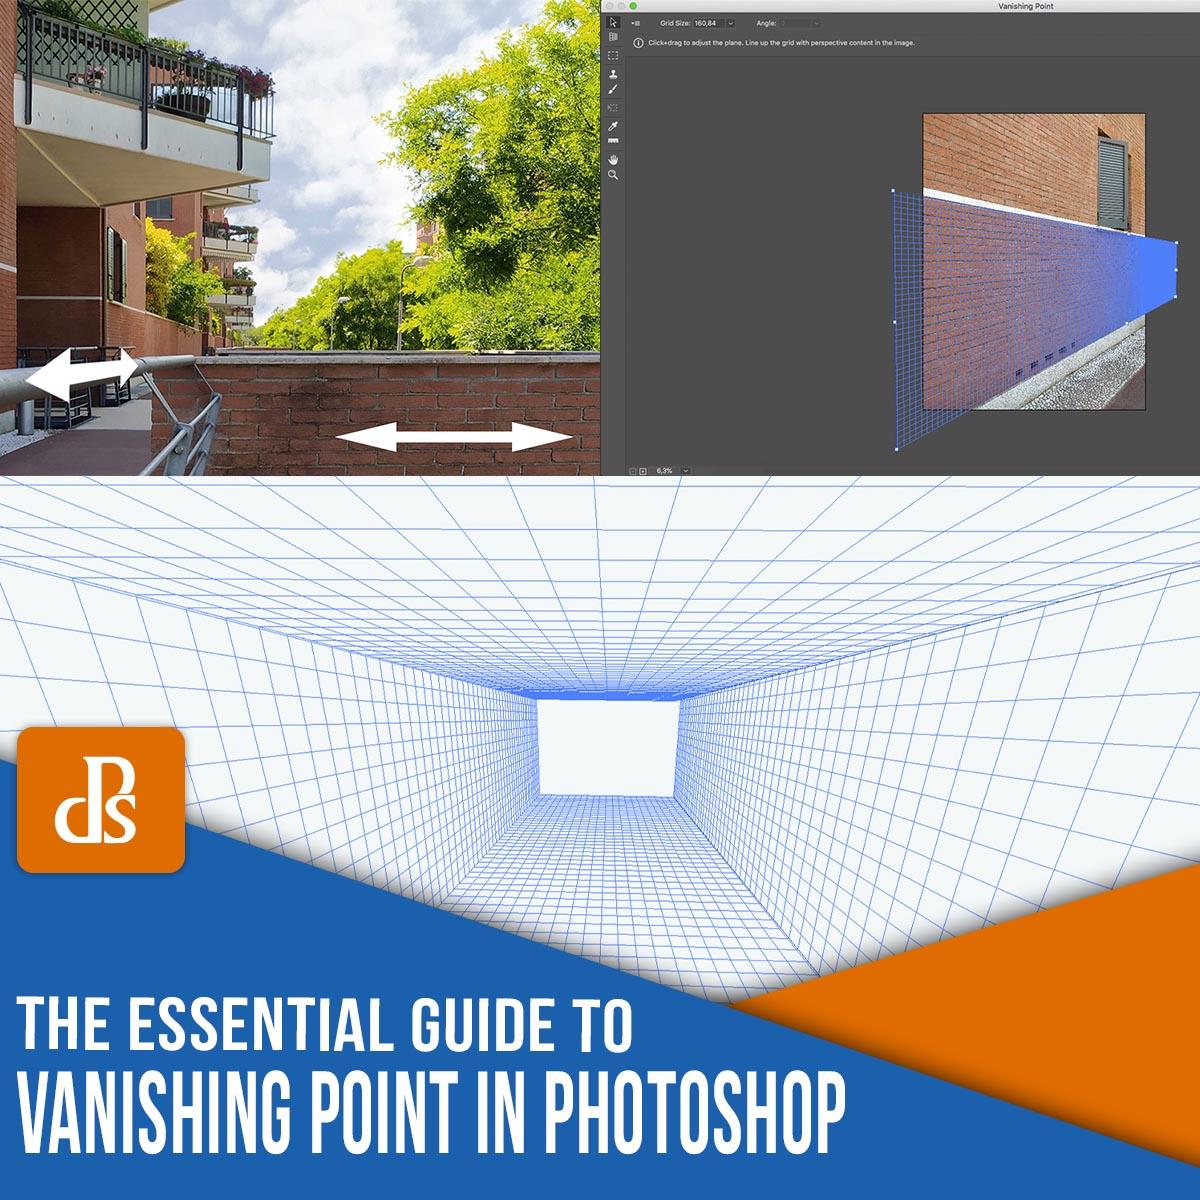 https://i2.wp.com/digital-photography-school.com/wp-content/uploads/2021/01/vanishing-point-in-photoshop-1004.jpg?resize=1200%2C1200&ssl=1